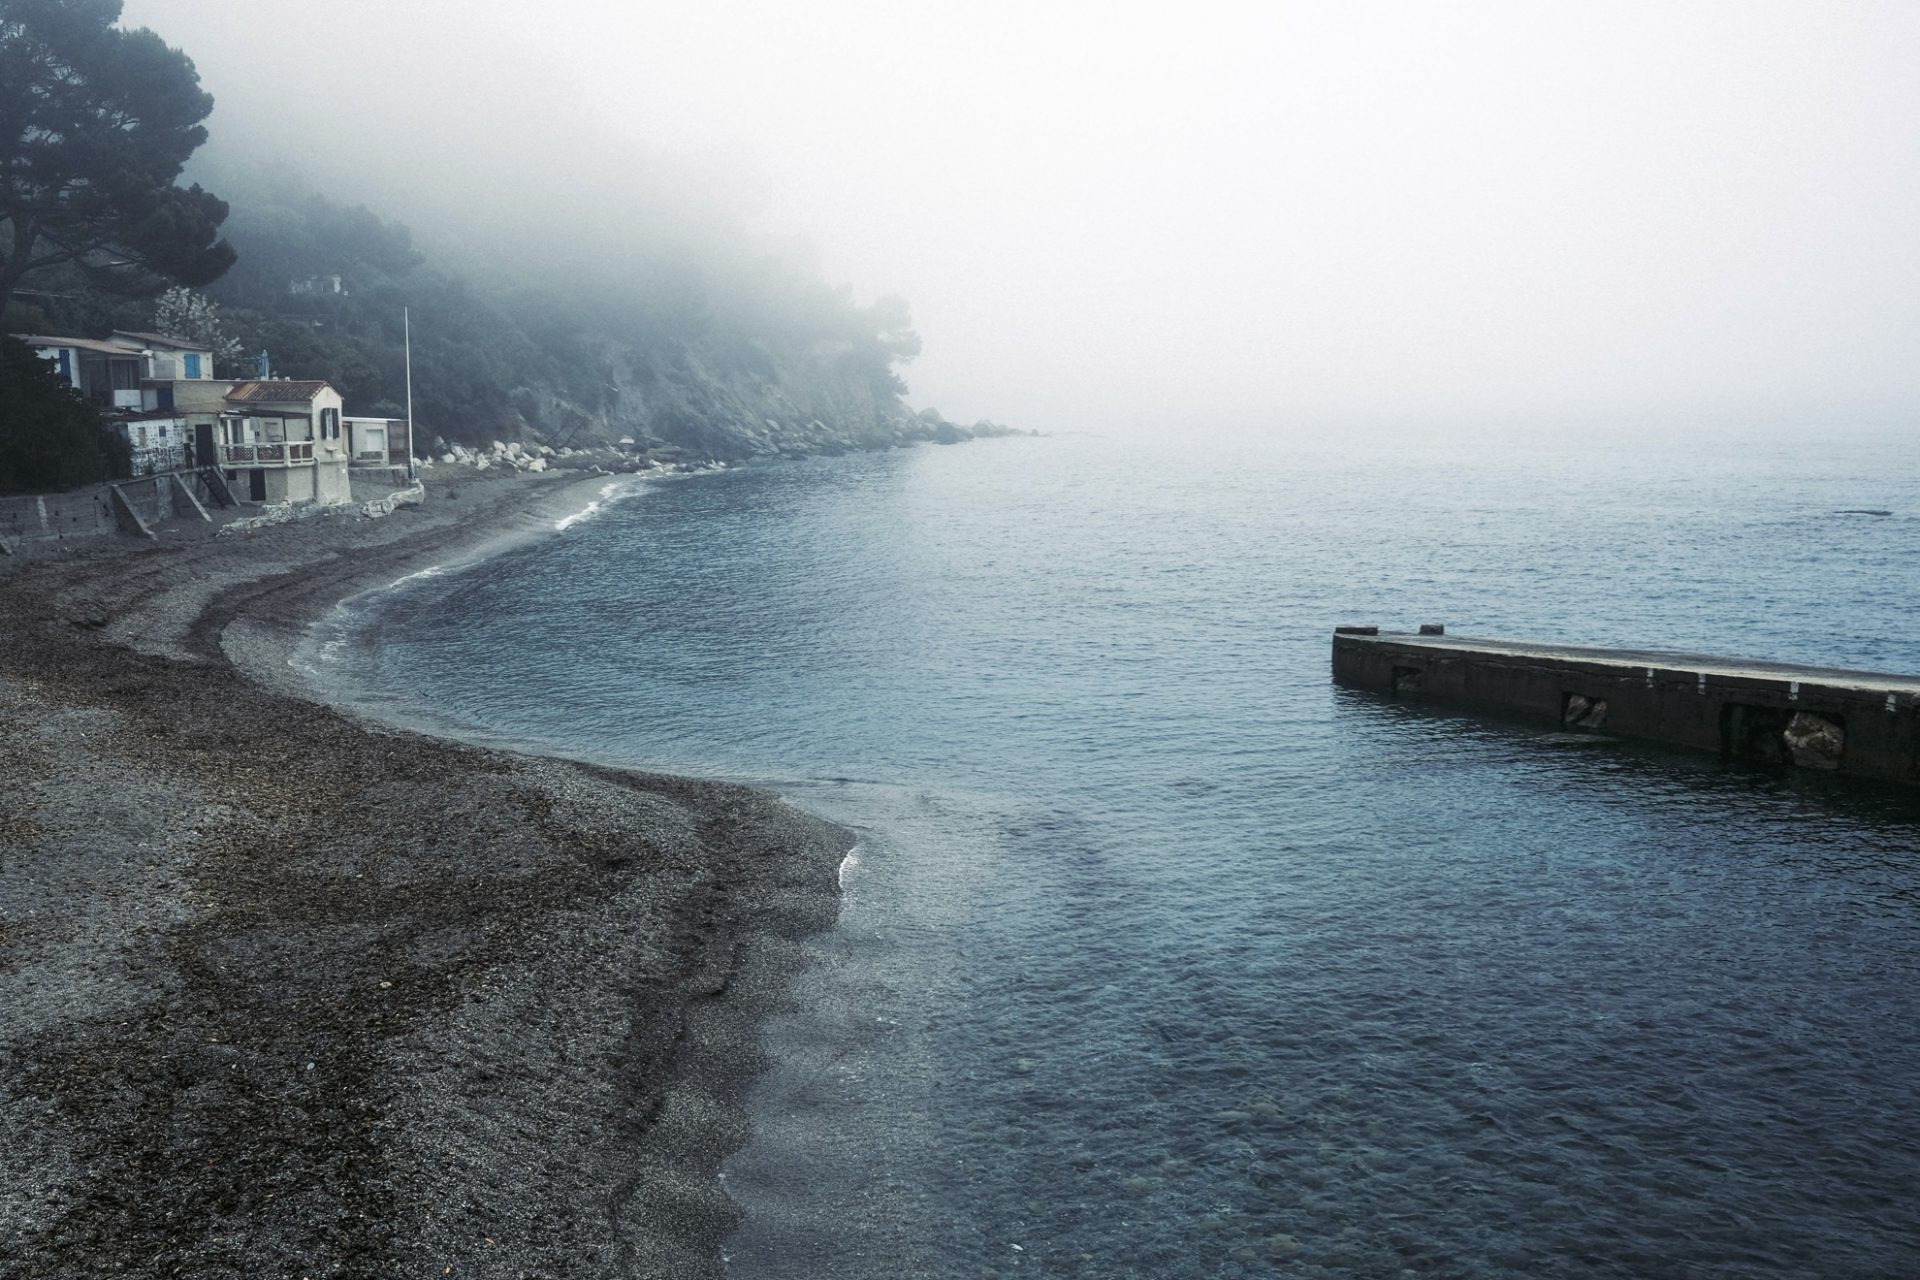 Fuji X100v pin de galle fog @laurentparienti-7